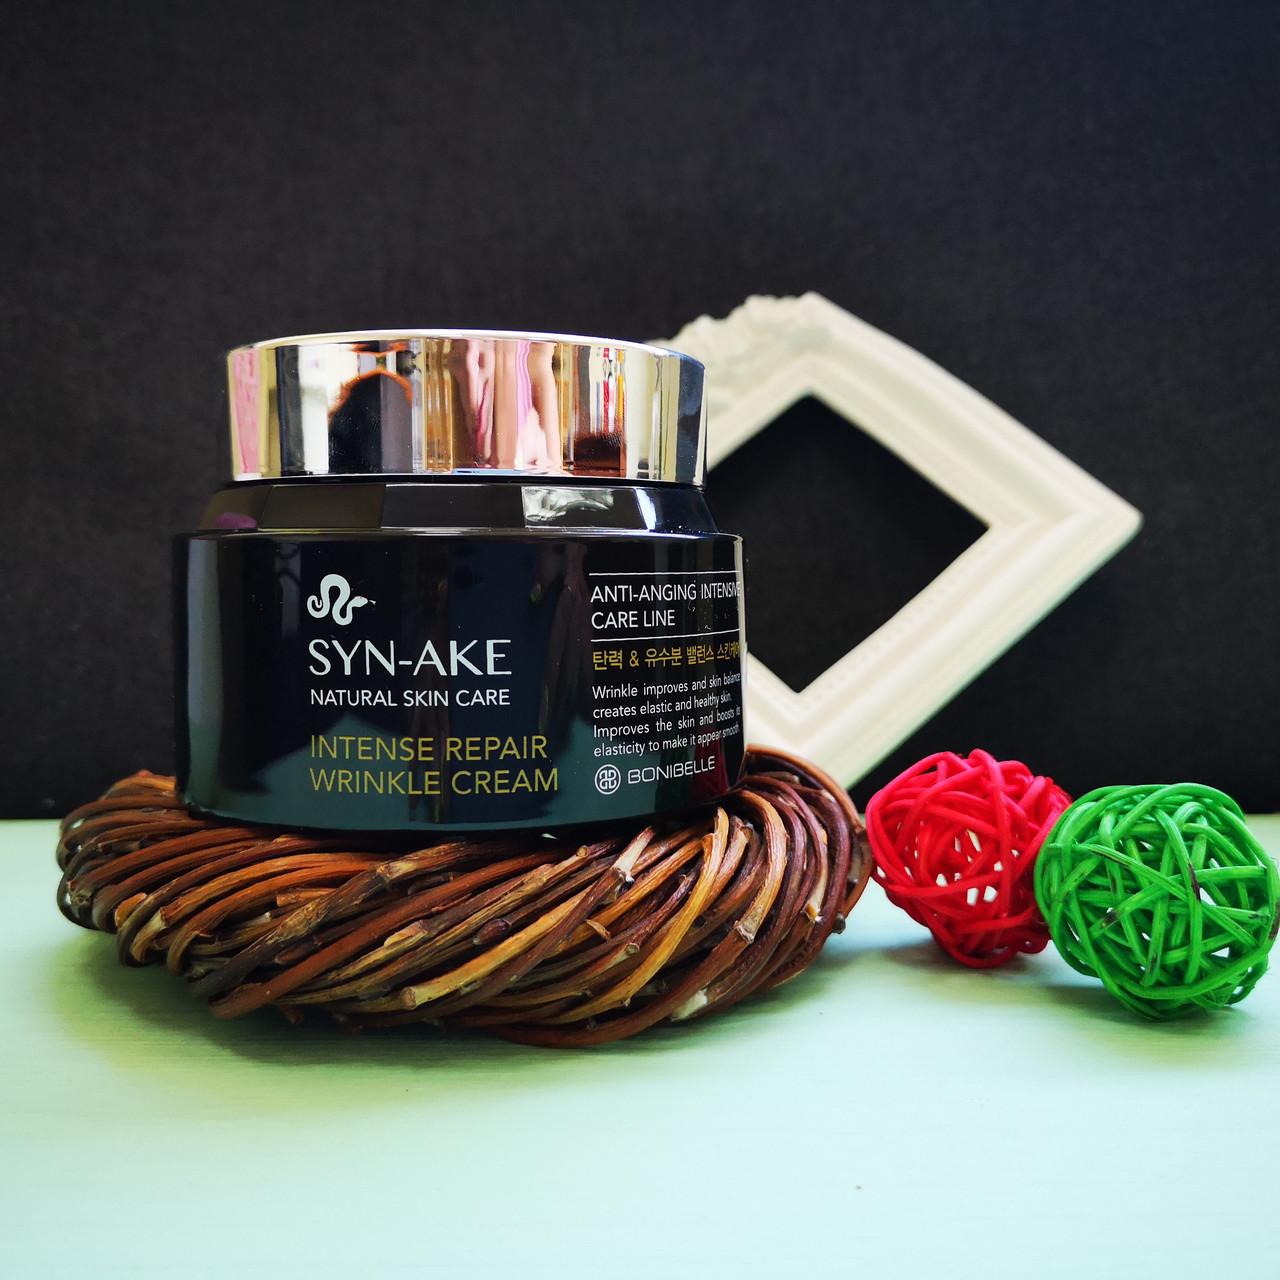 Интенсивный крем против морщин с пептидом змеиного яда Bonibelle Syn Ake Intense Repair Wrinkle Cream